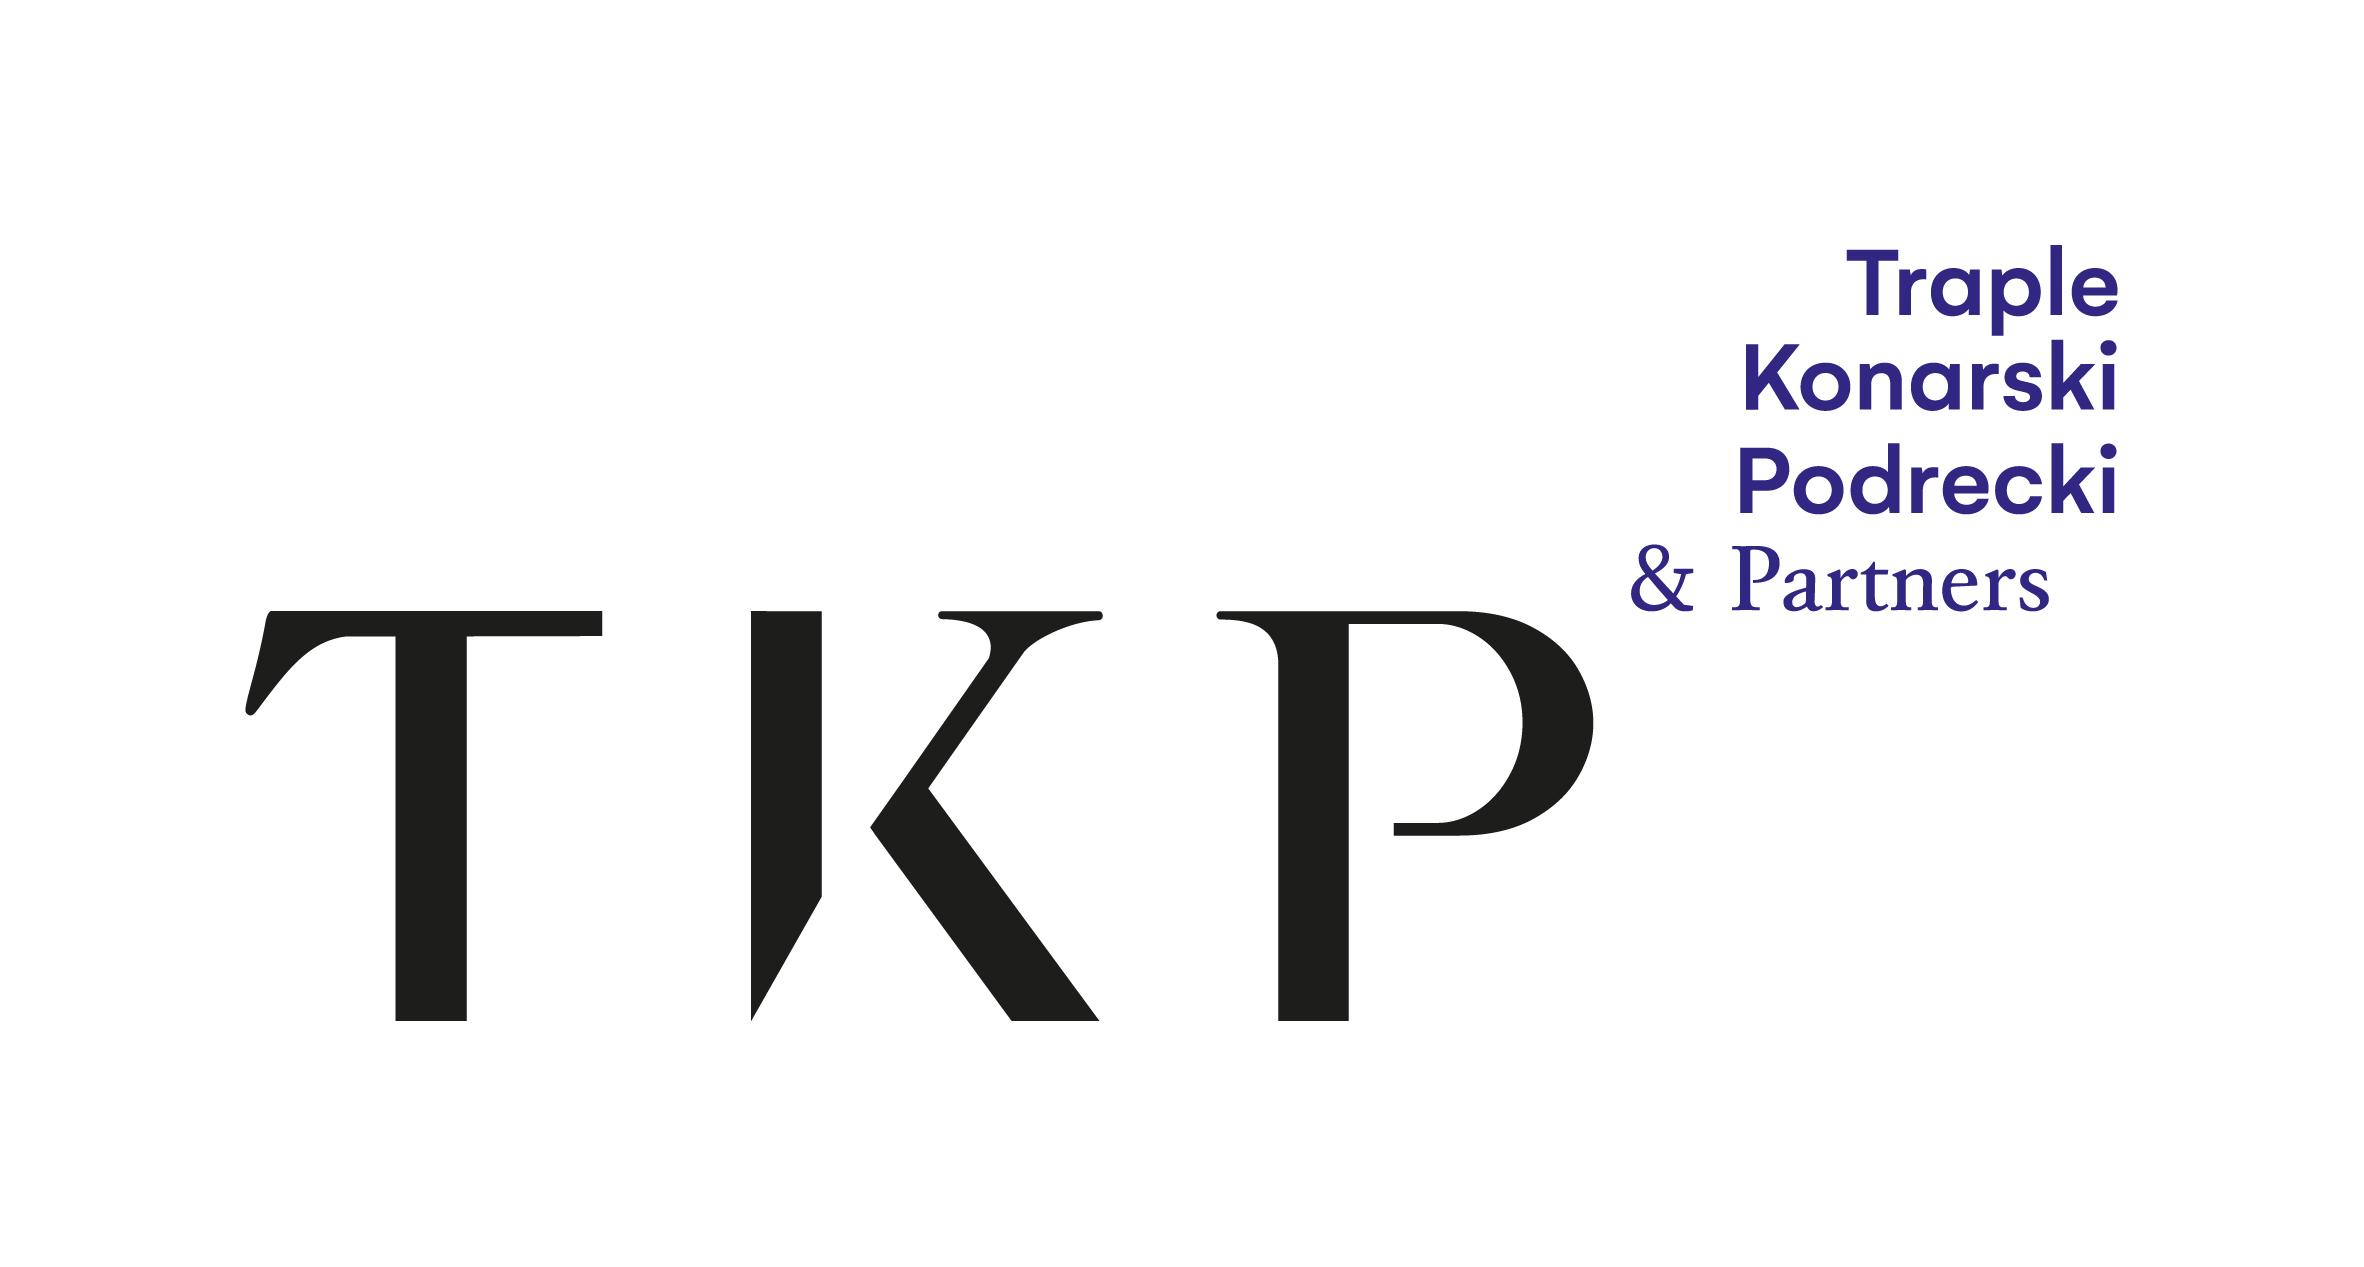 Traple Konarski Podrecki & Wspólnicy logo